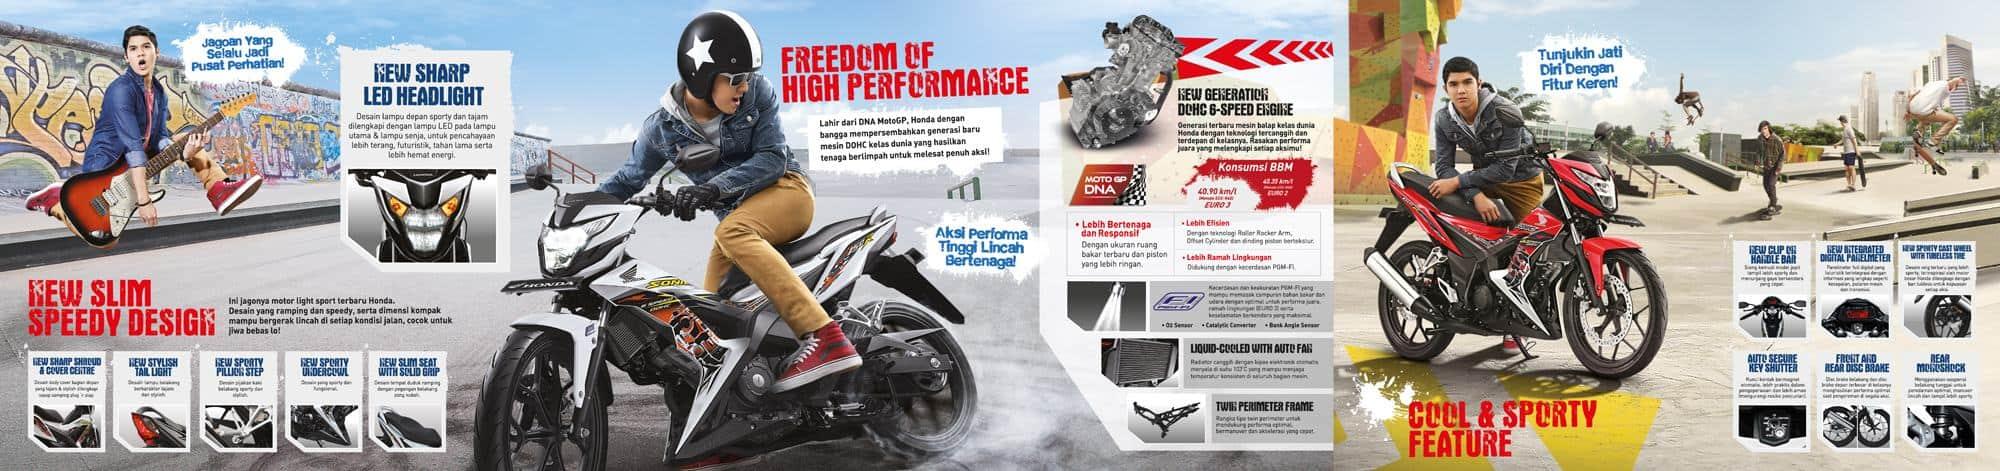 Brosur Motor Honda Sonic 150R - 2